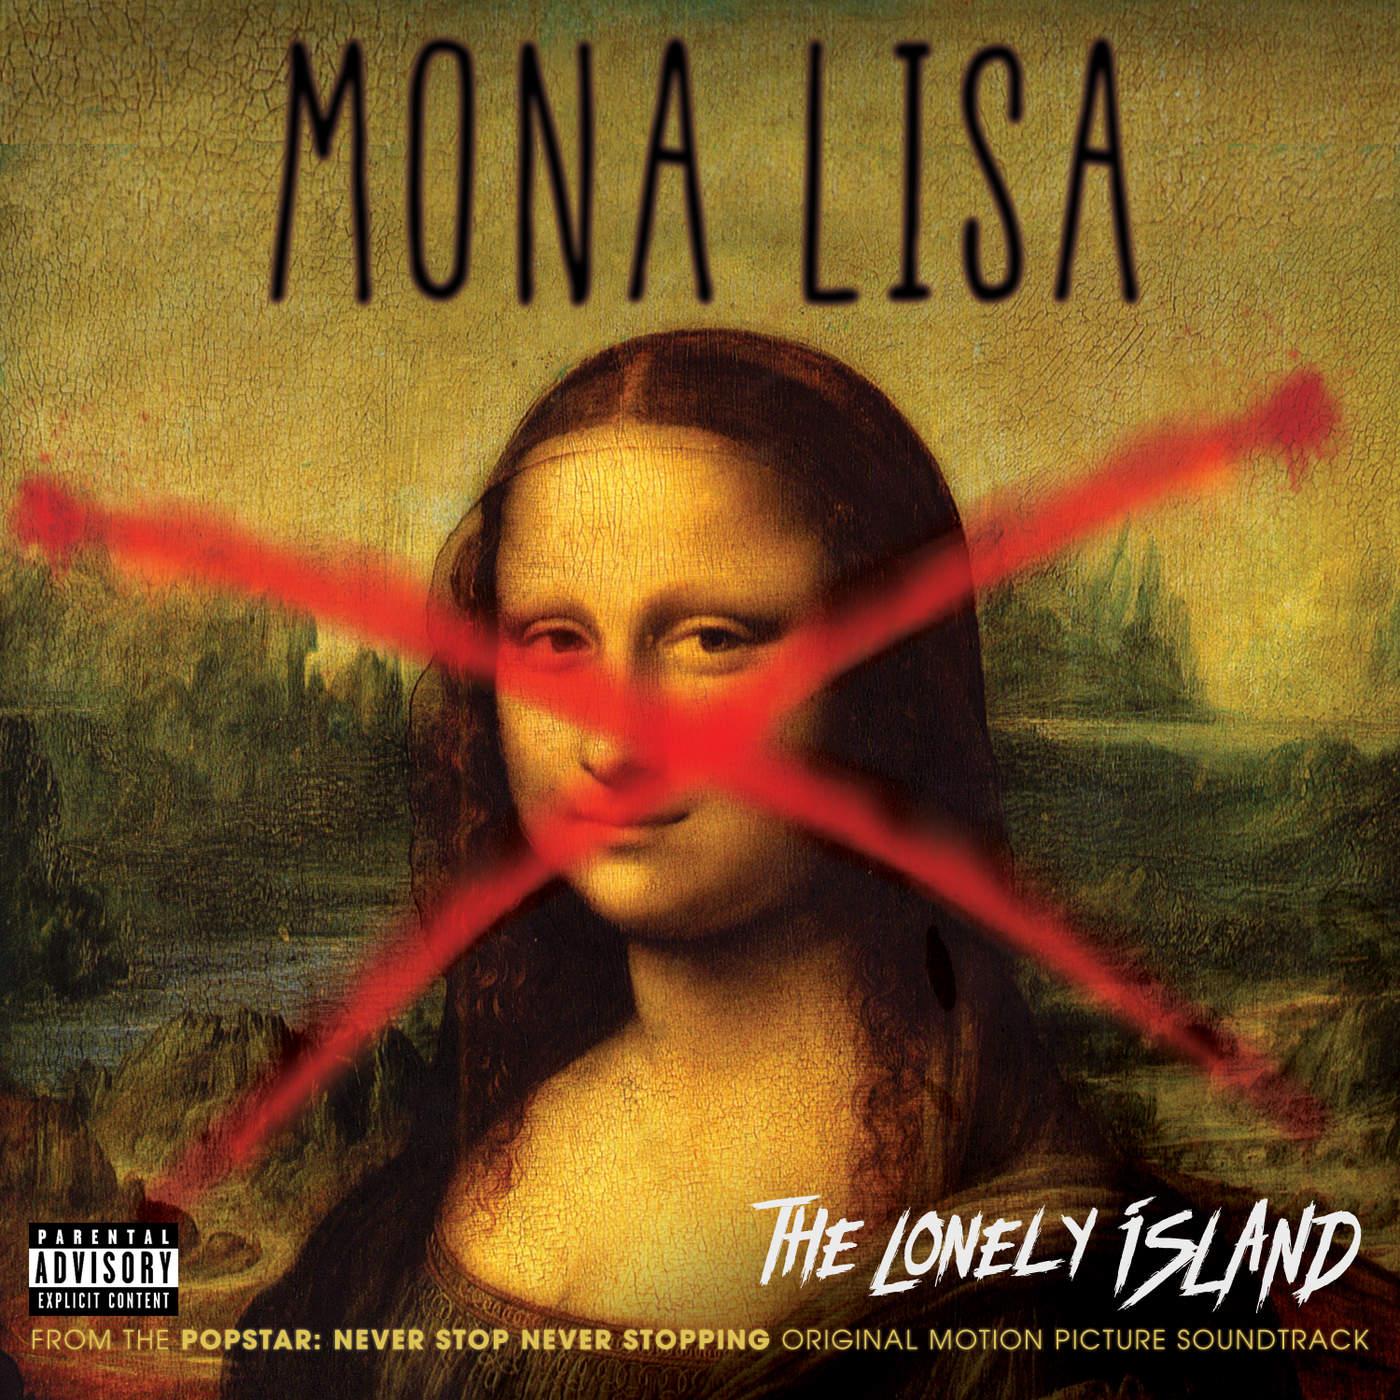 The Lonely Island - Mona Lisa - Single